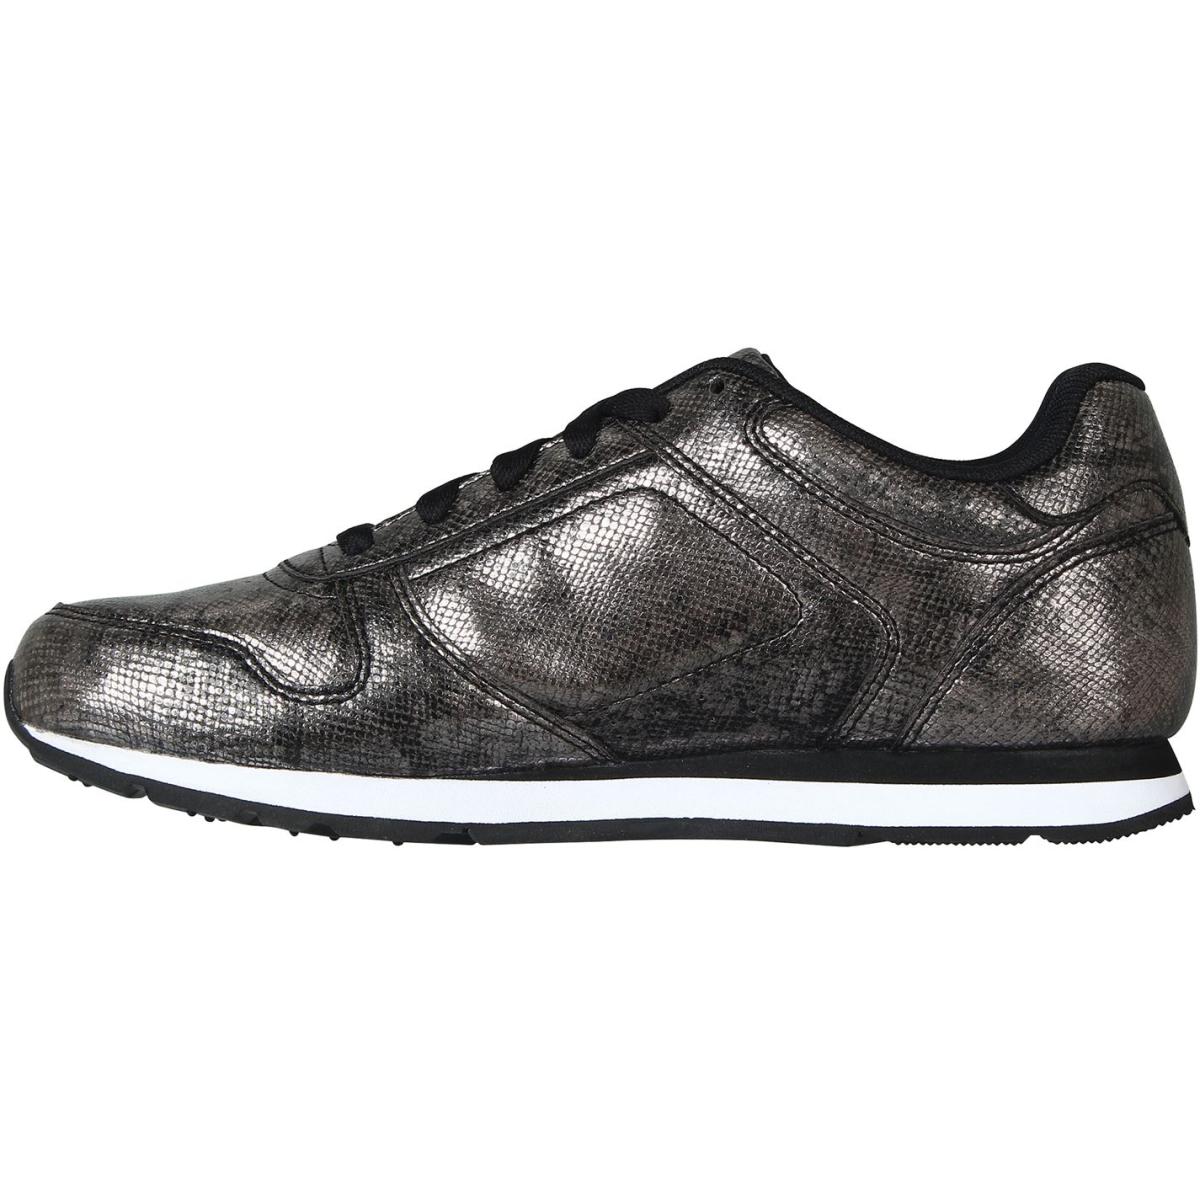 Slazenger-Classic-Turnschuhe-Laufschuhe-Damen-Sportschuhe-Sneaker-1265 Indexbild 5